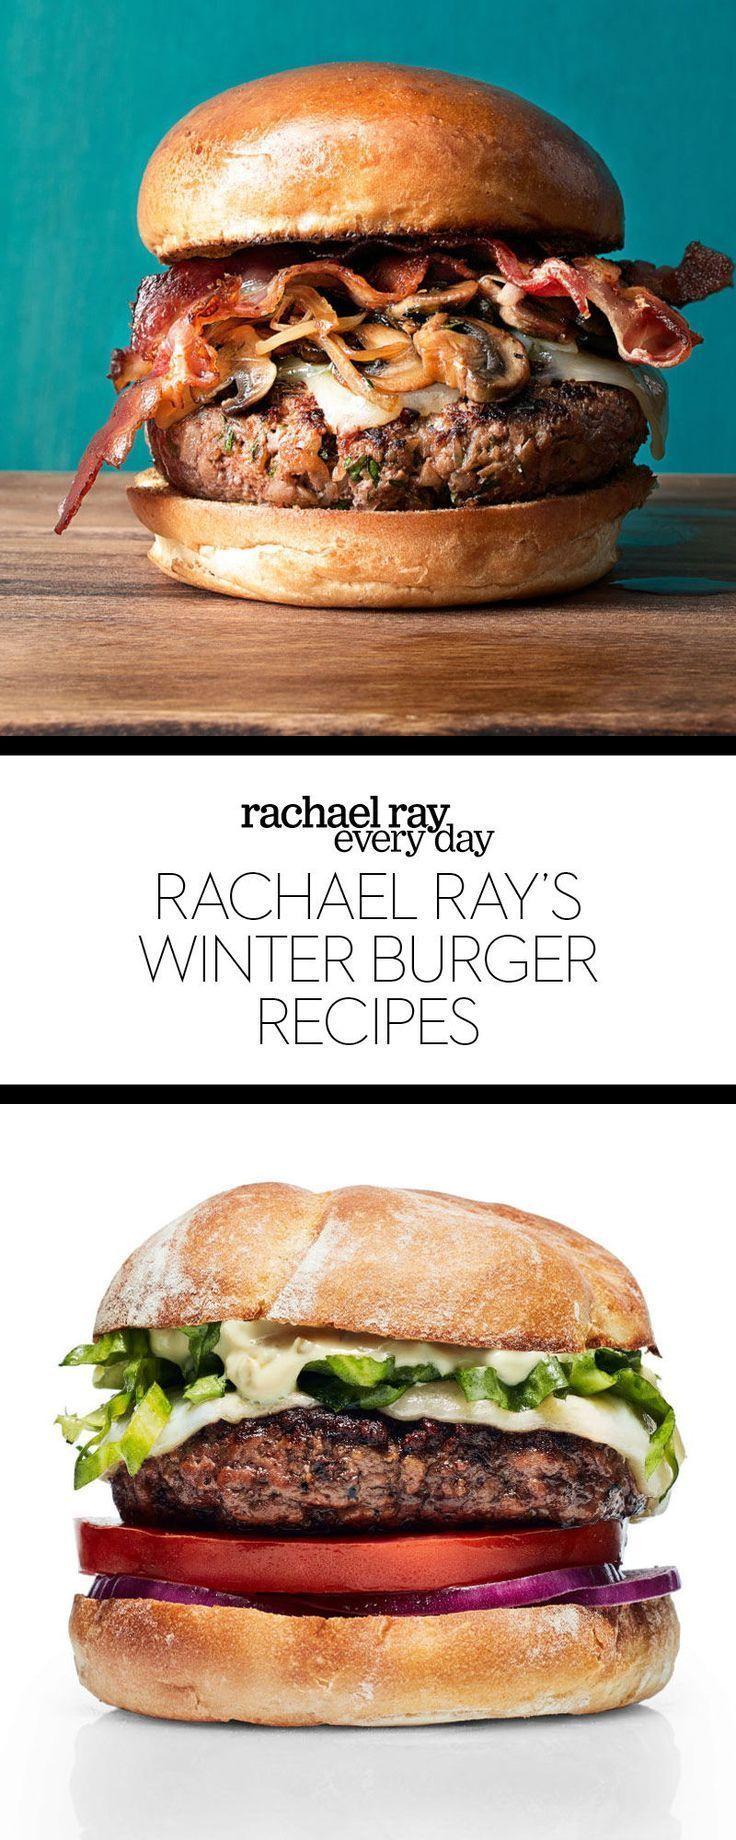 Rachael Ray S Winter Burger Recipes Rachael Ray Every Day Burgers Dinnerrecipesrachaelray Burger Recipes Beef Healthy Burger Recipes Best Burger Recipe